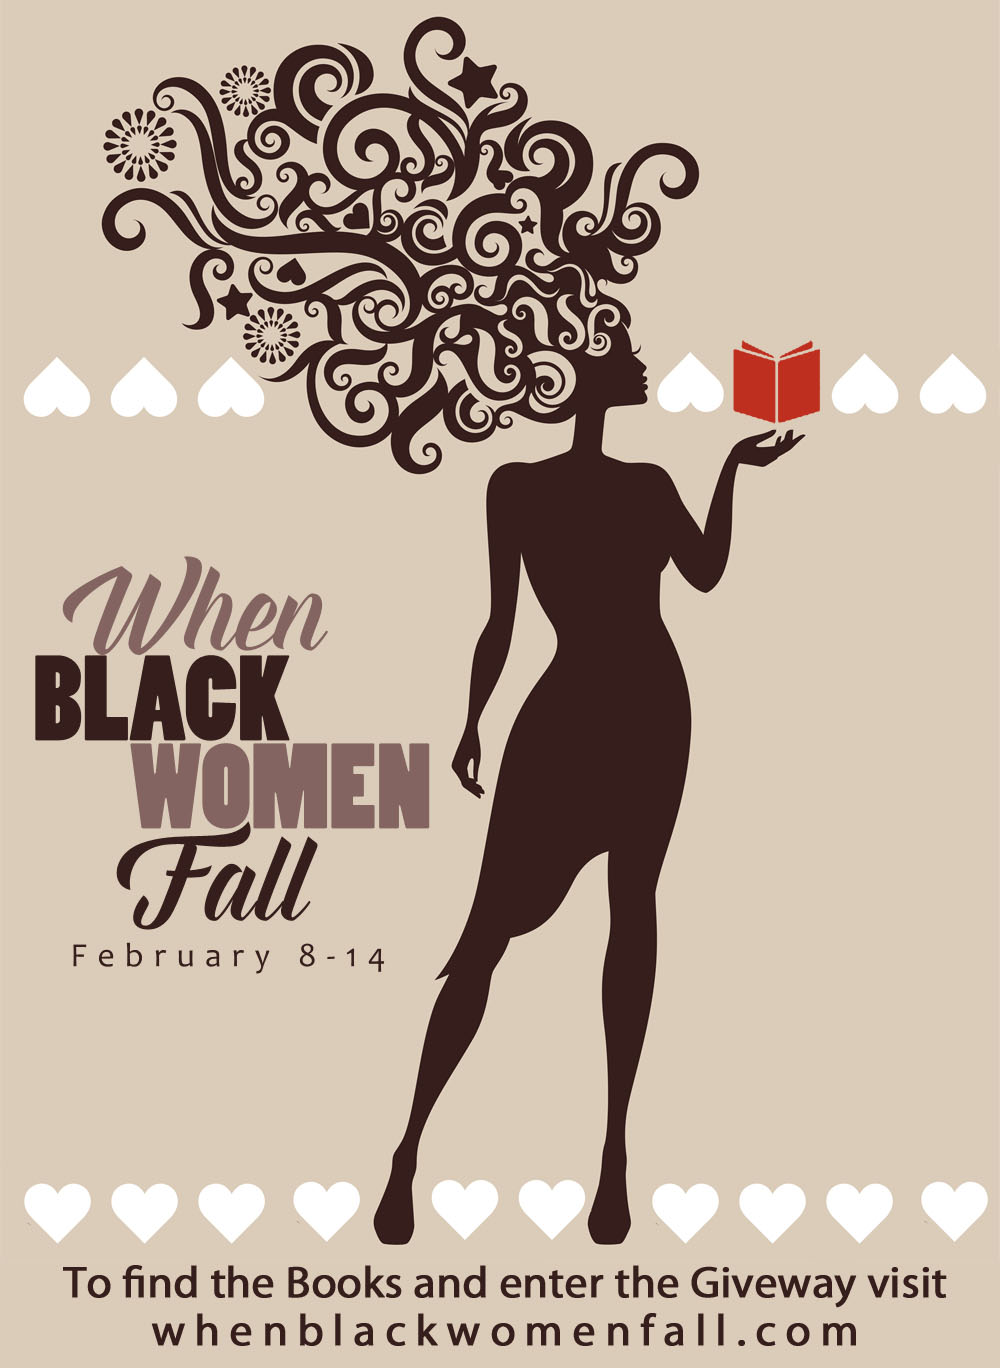 http://whenblackwomenfall.com/